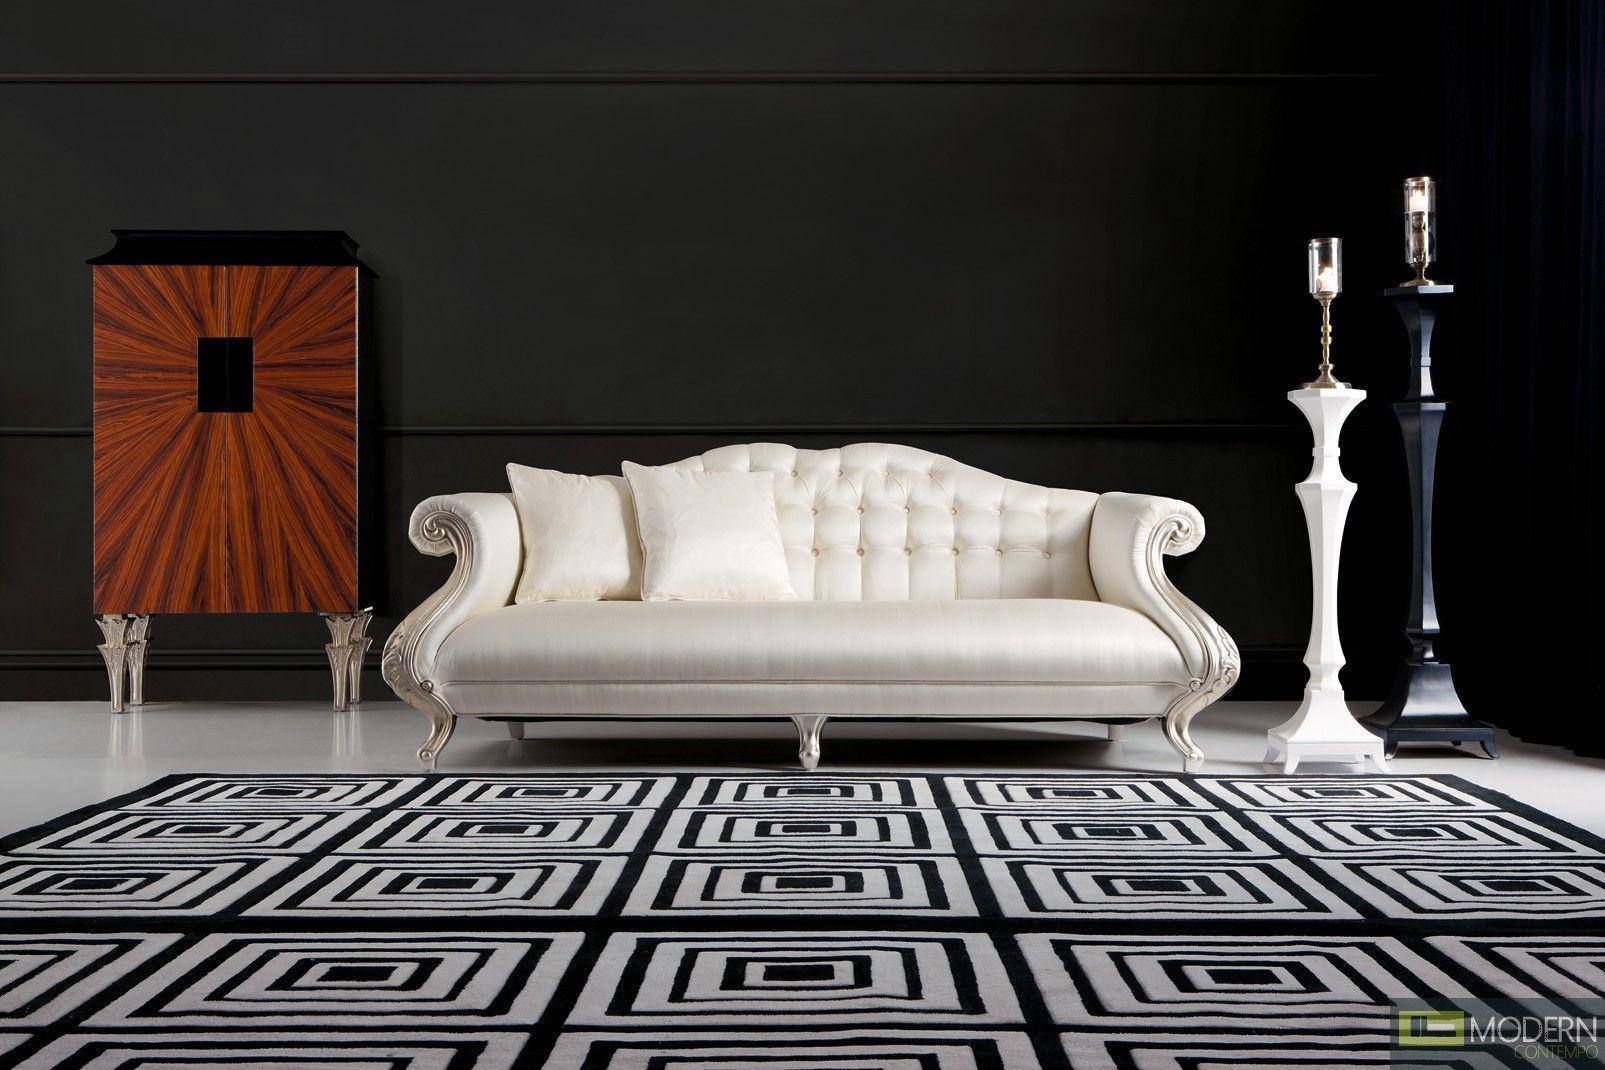 Avellino neo classic luxury italian sofa set 6 895 - Classic italian living room furniture sets ...